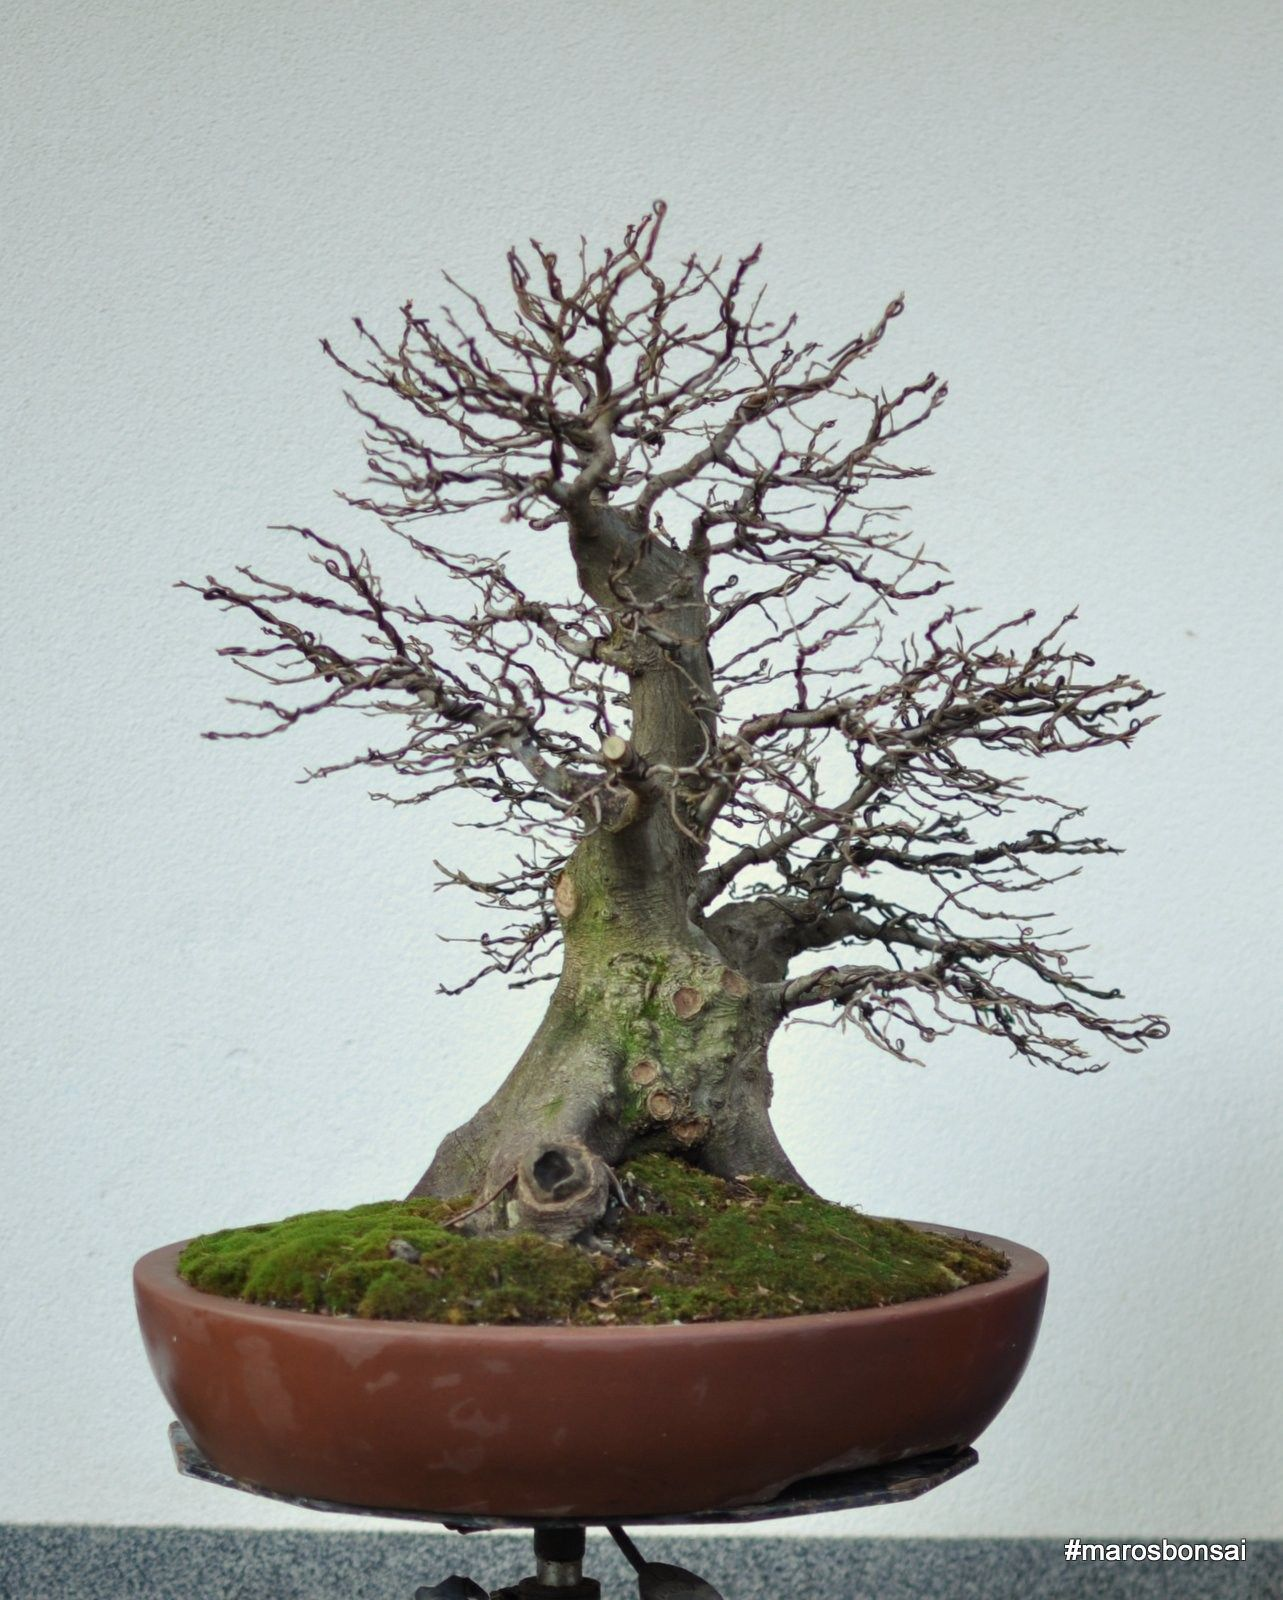 27 Elegant Best Fertilizer For Juniper Bonsai Pictures Bonsai Gallery Bonsai Trees For Sale Juniper Bonsai Fertilizer